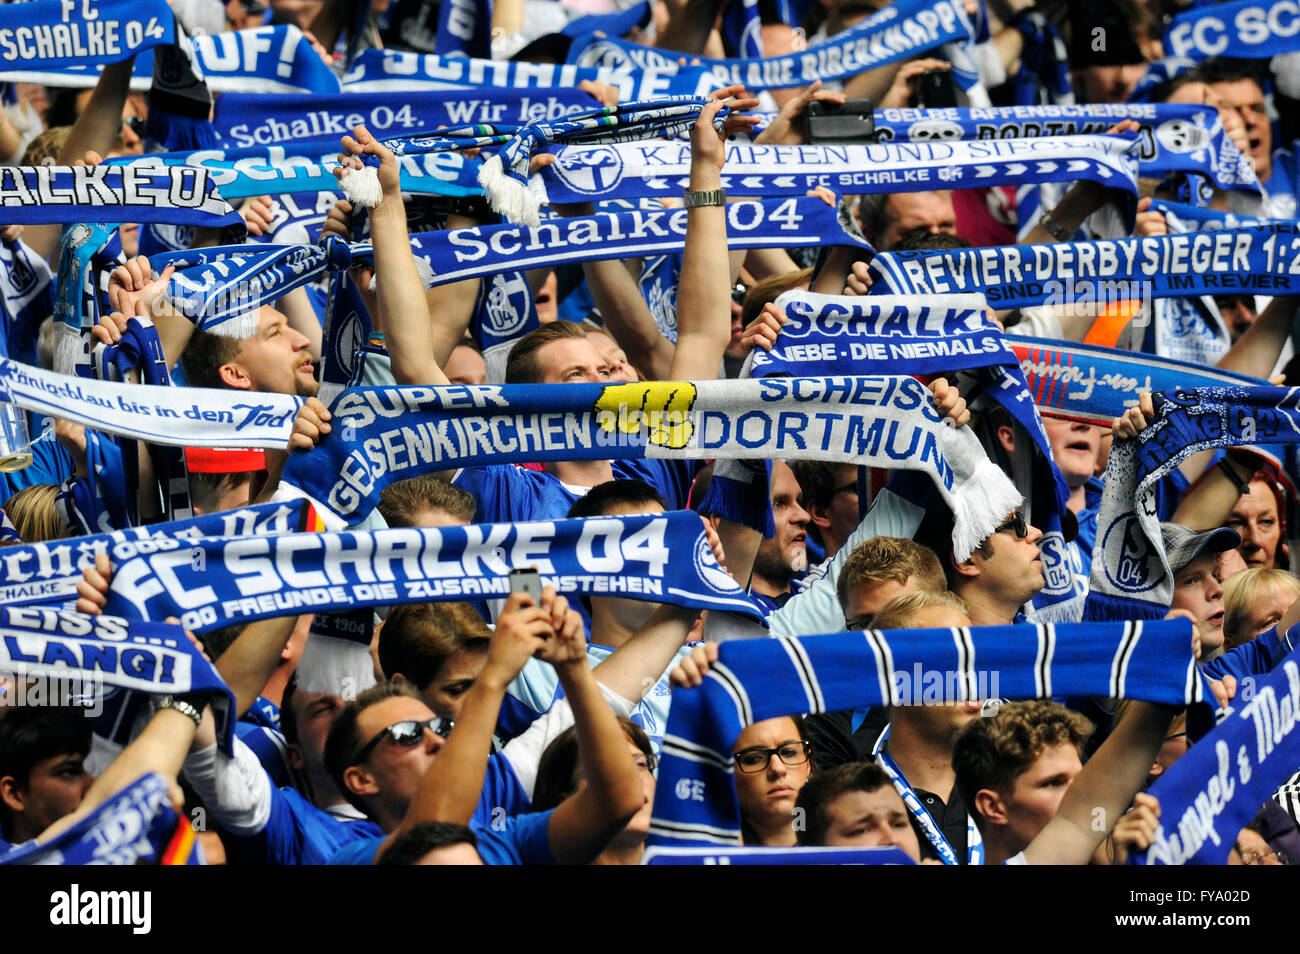 Schalke Fans On The North Stand Holding Up Scarves Fc Schalke 04 Stock Photo Alamy